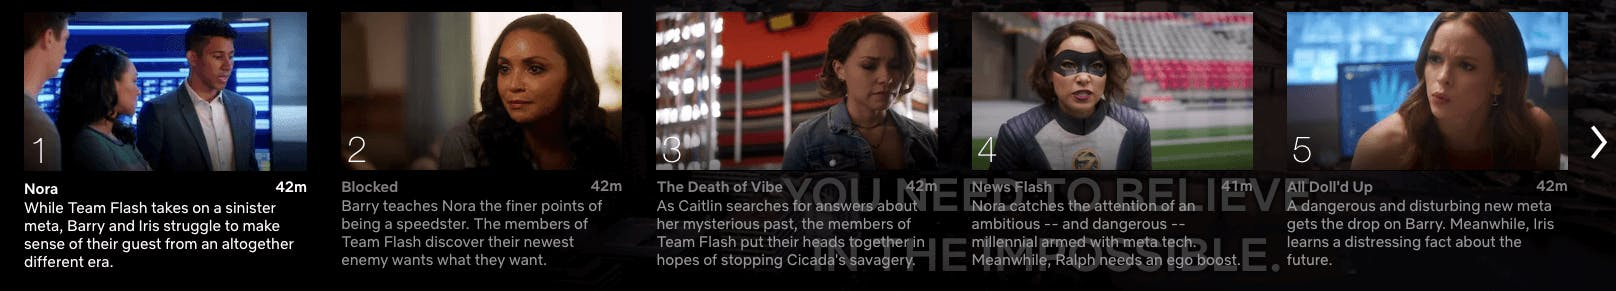 watch the flash season 6 on Netflix